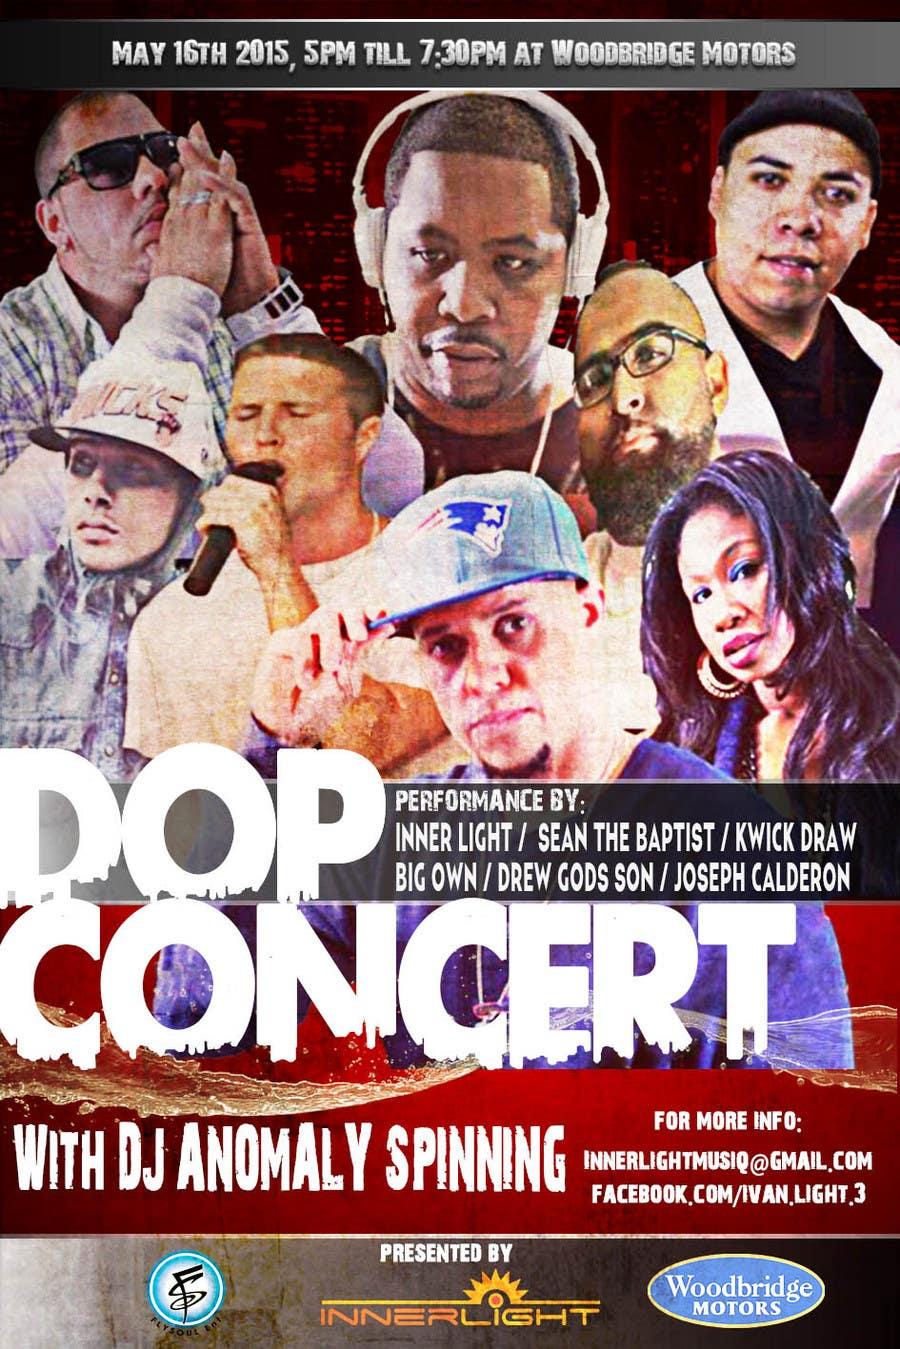 Penyertaan Peraduan #1 untuk Design a Flyer for Concert